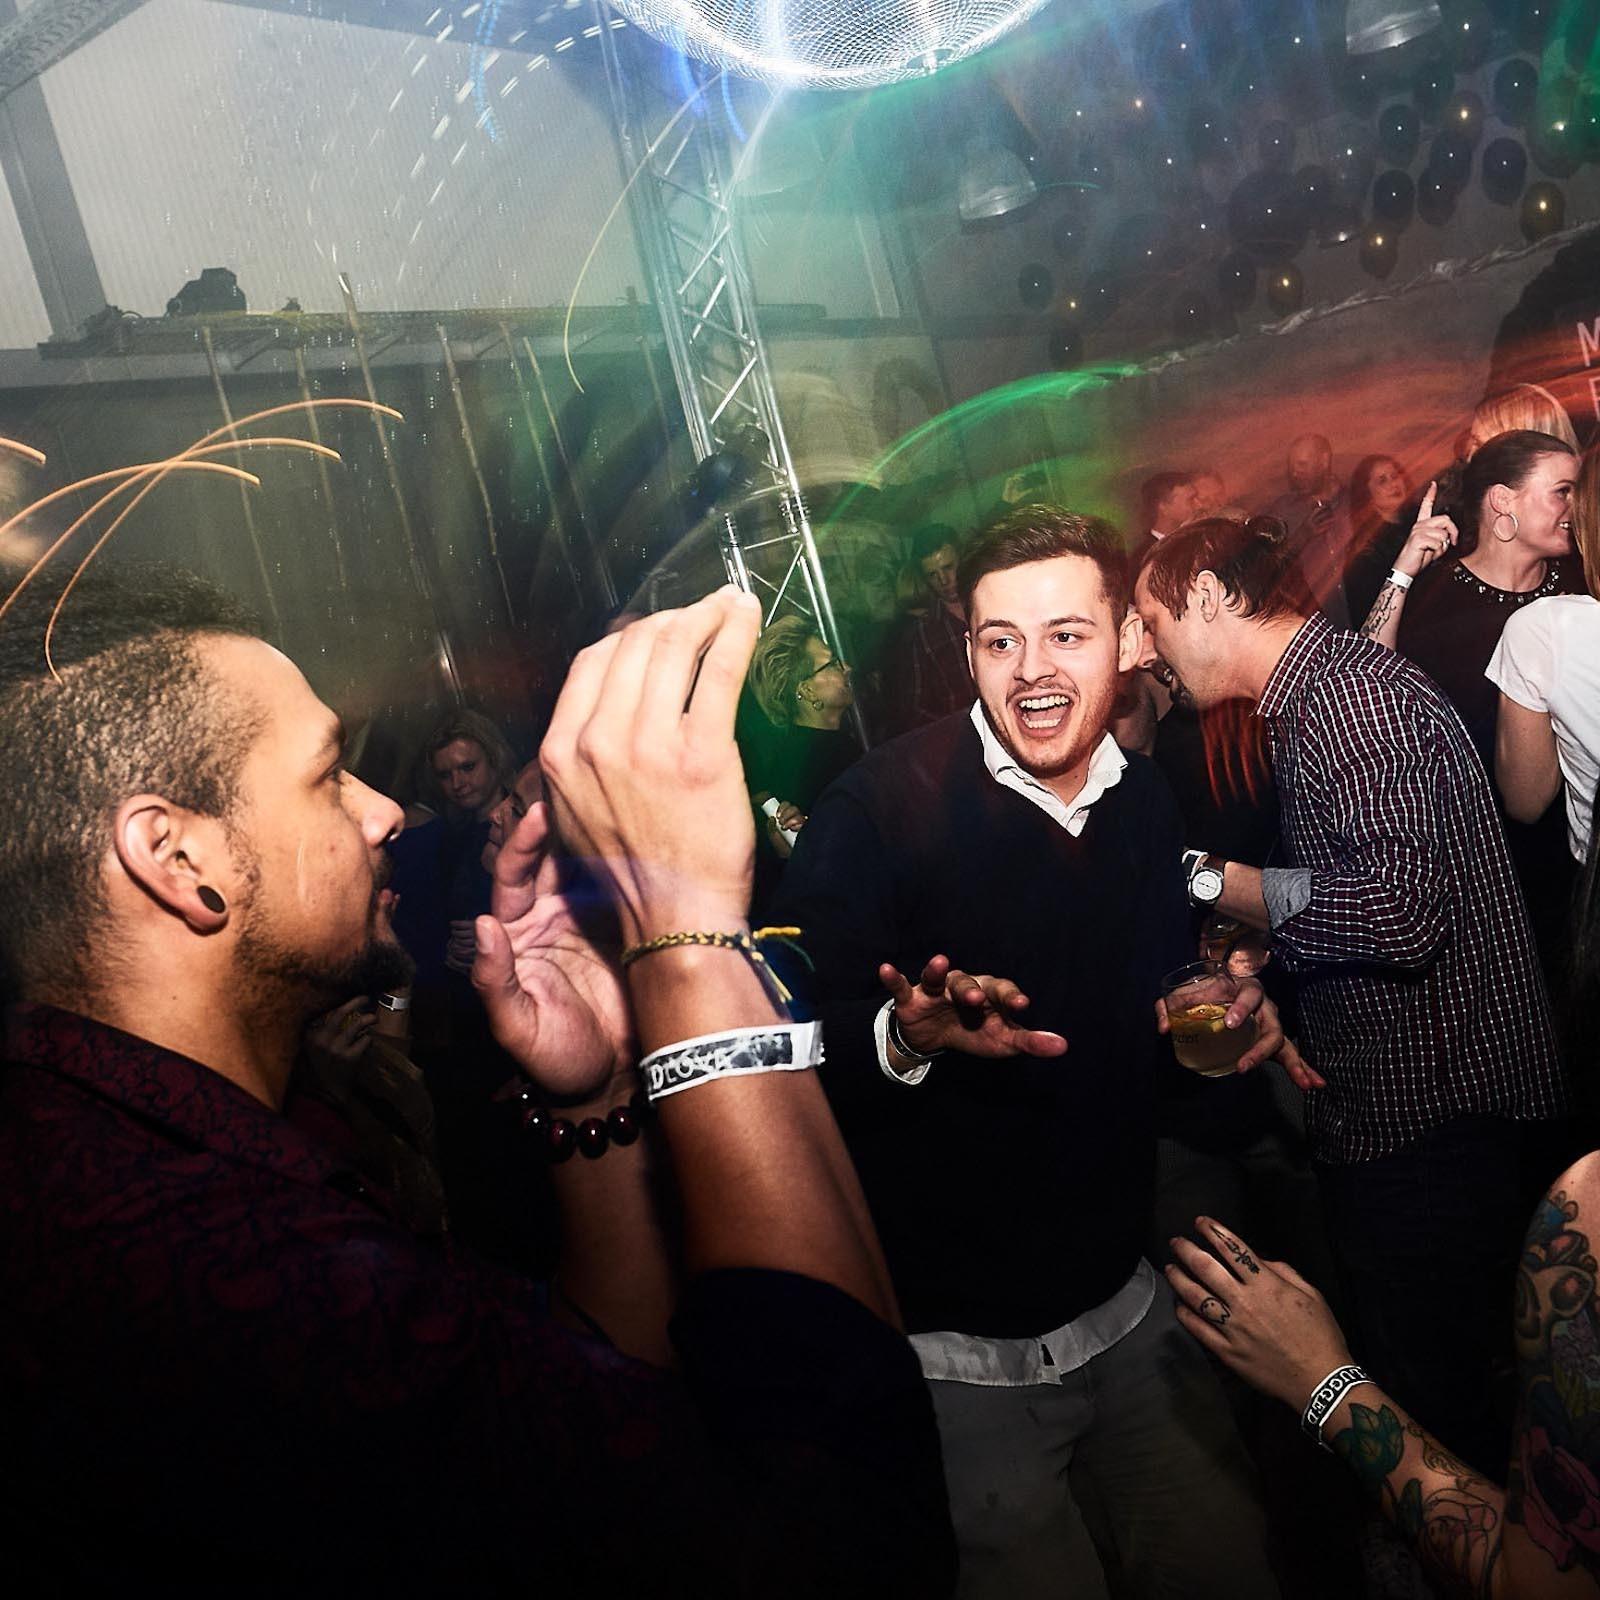 DJane | DJ | Hannover | Glitzerplatte | Club | Electro | Party | Wedding | Event | Messe | Charity | Gala | Buchen | Mieten